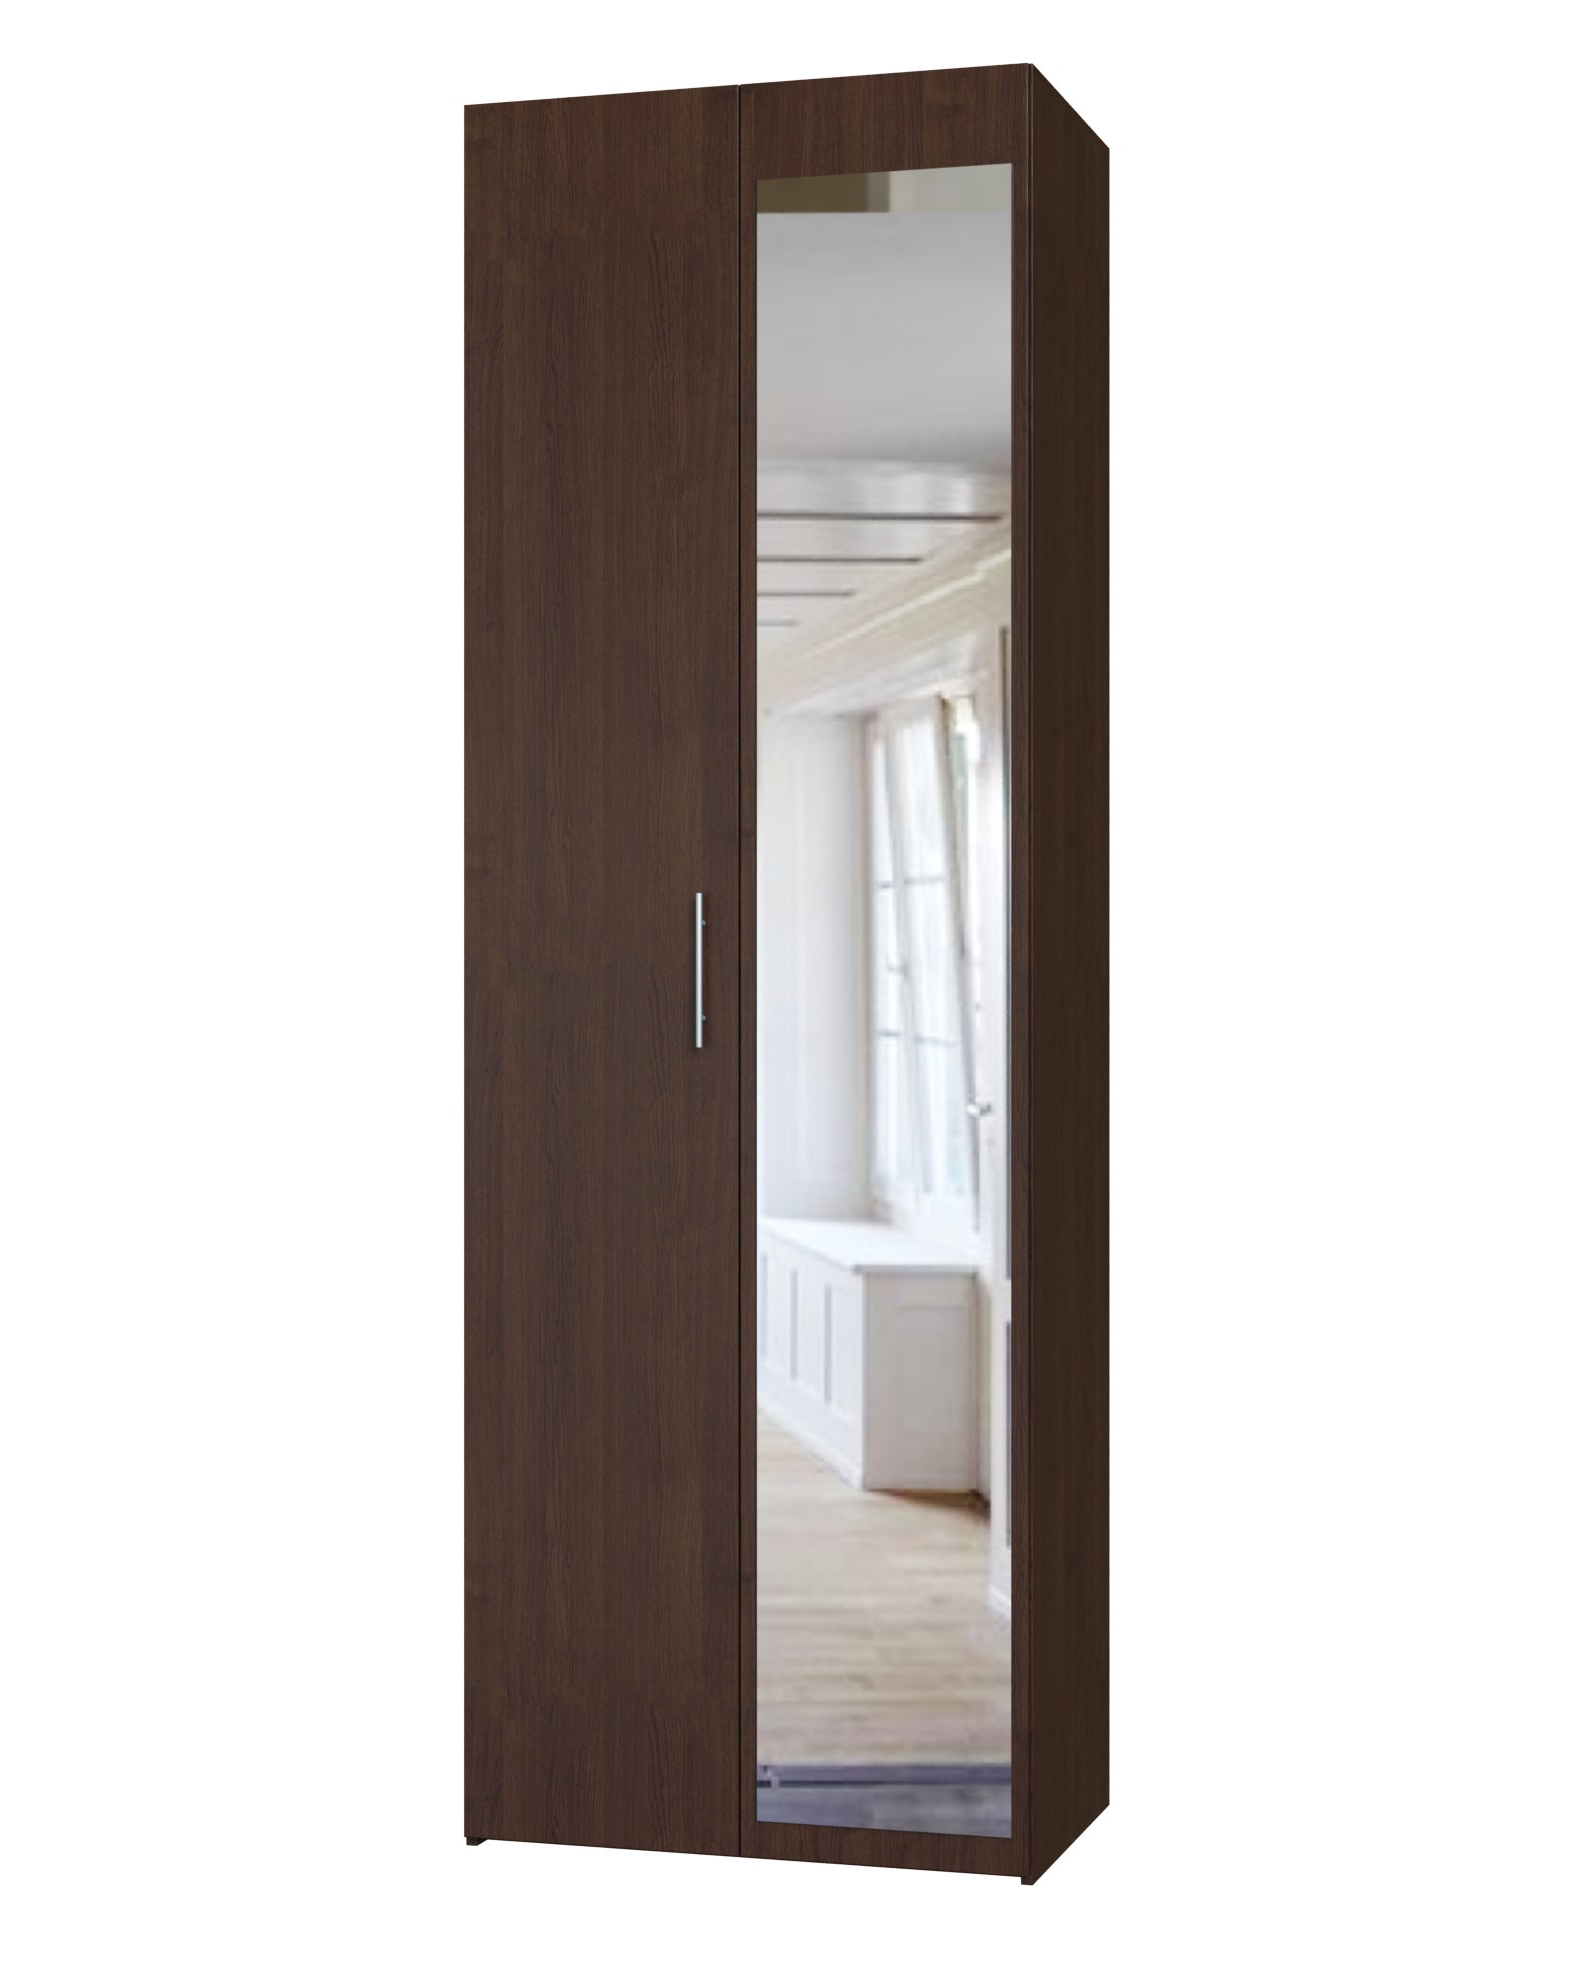 Шкаф-гармошка Палермо шатура качели палермо премиум мебельная ткань